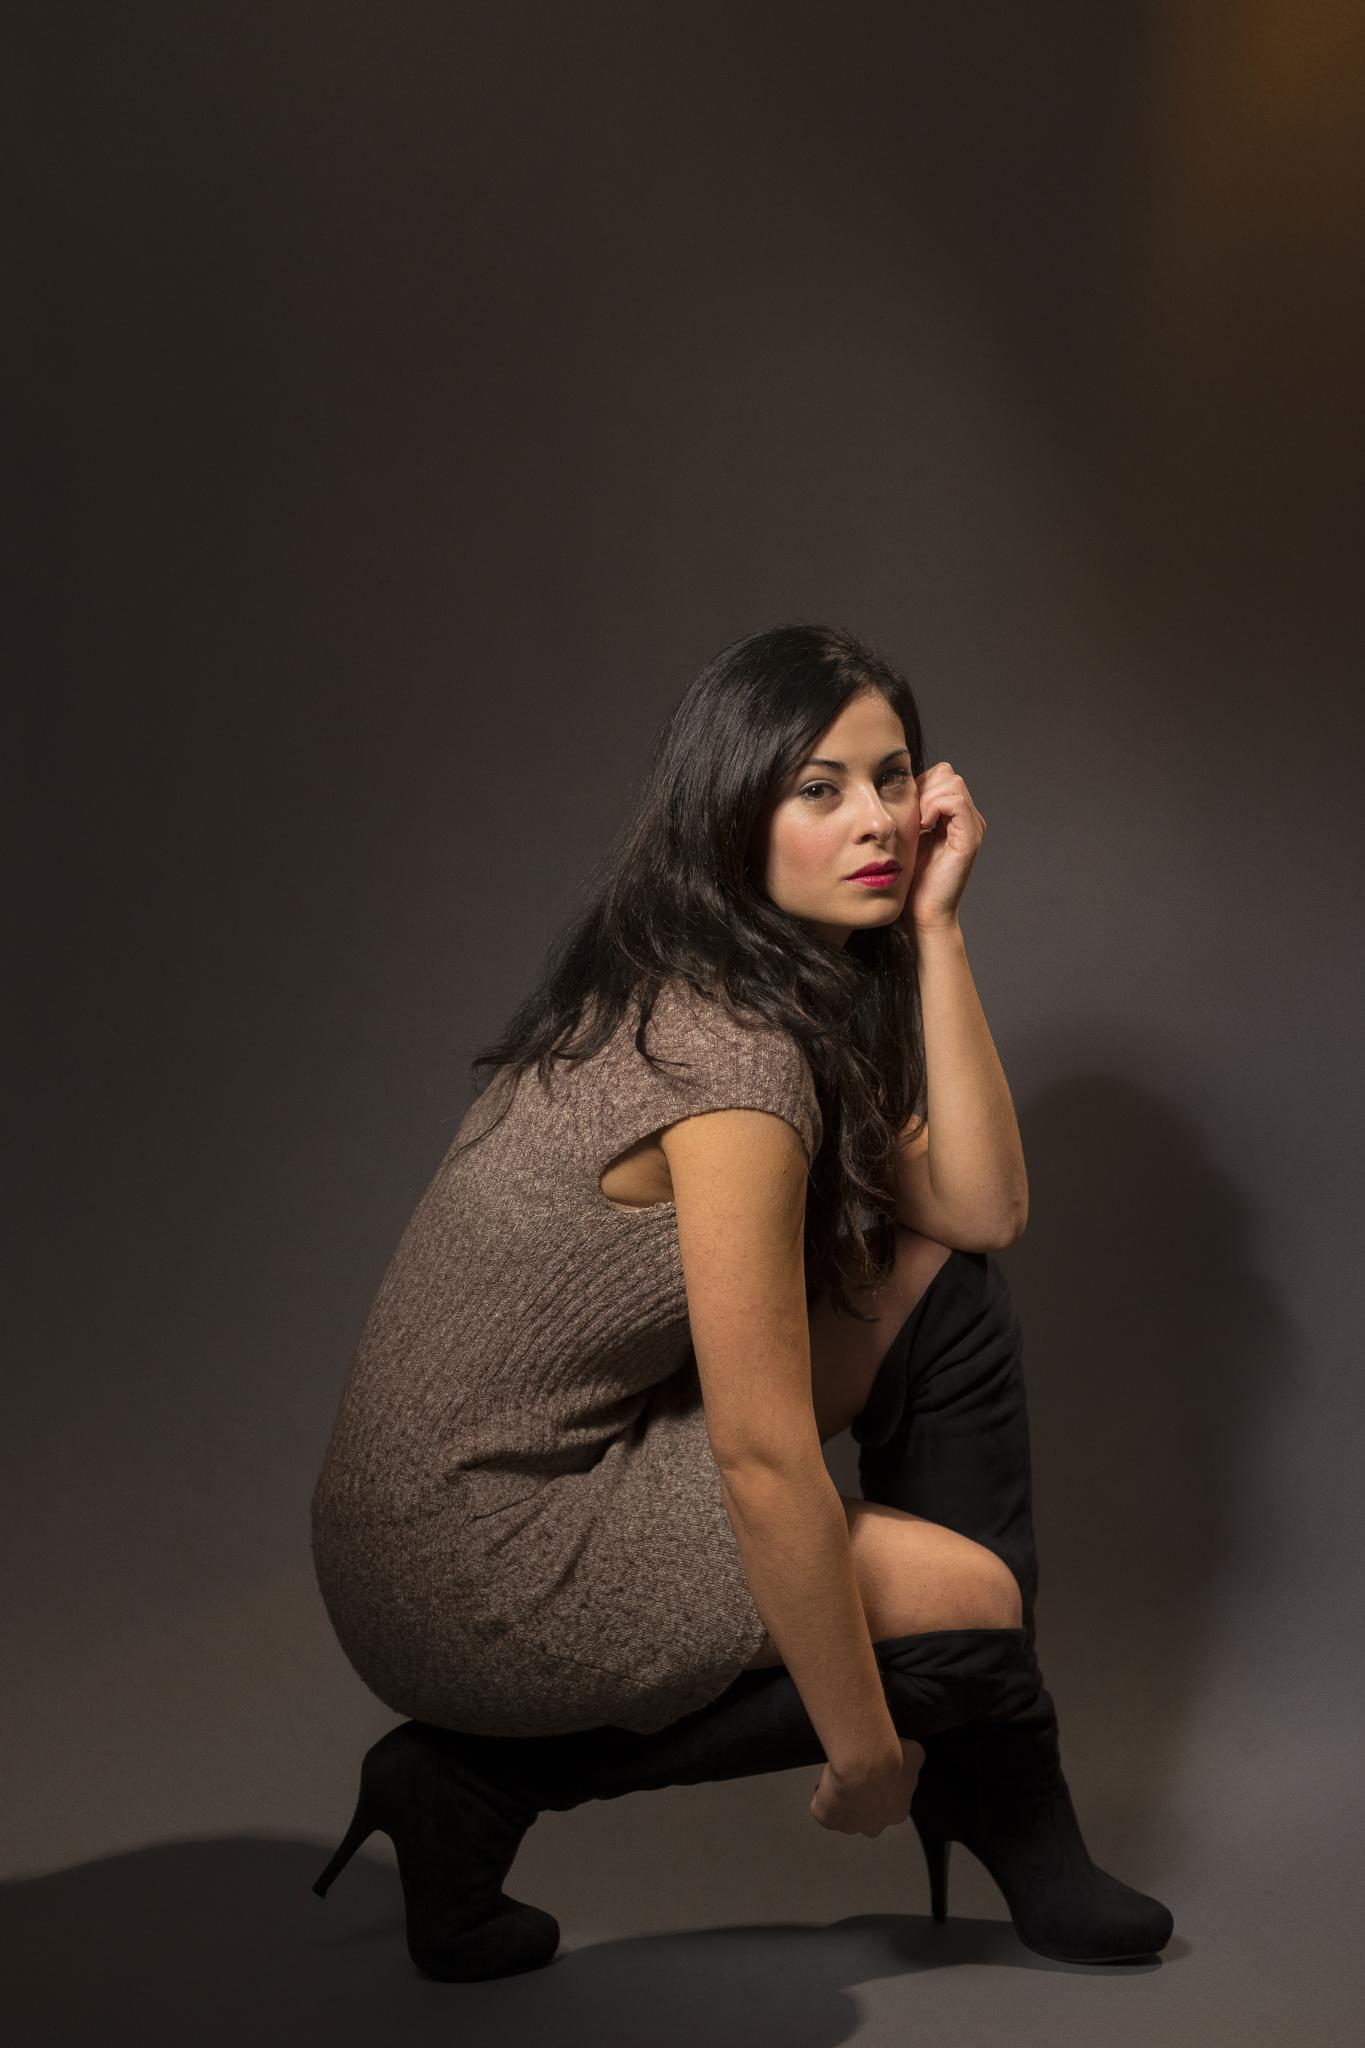 Inma Ortega Carmona by ddsfotografia